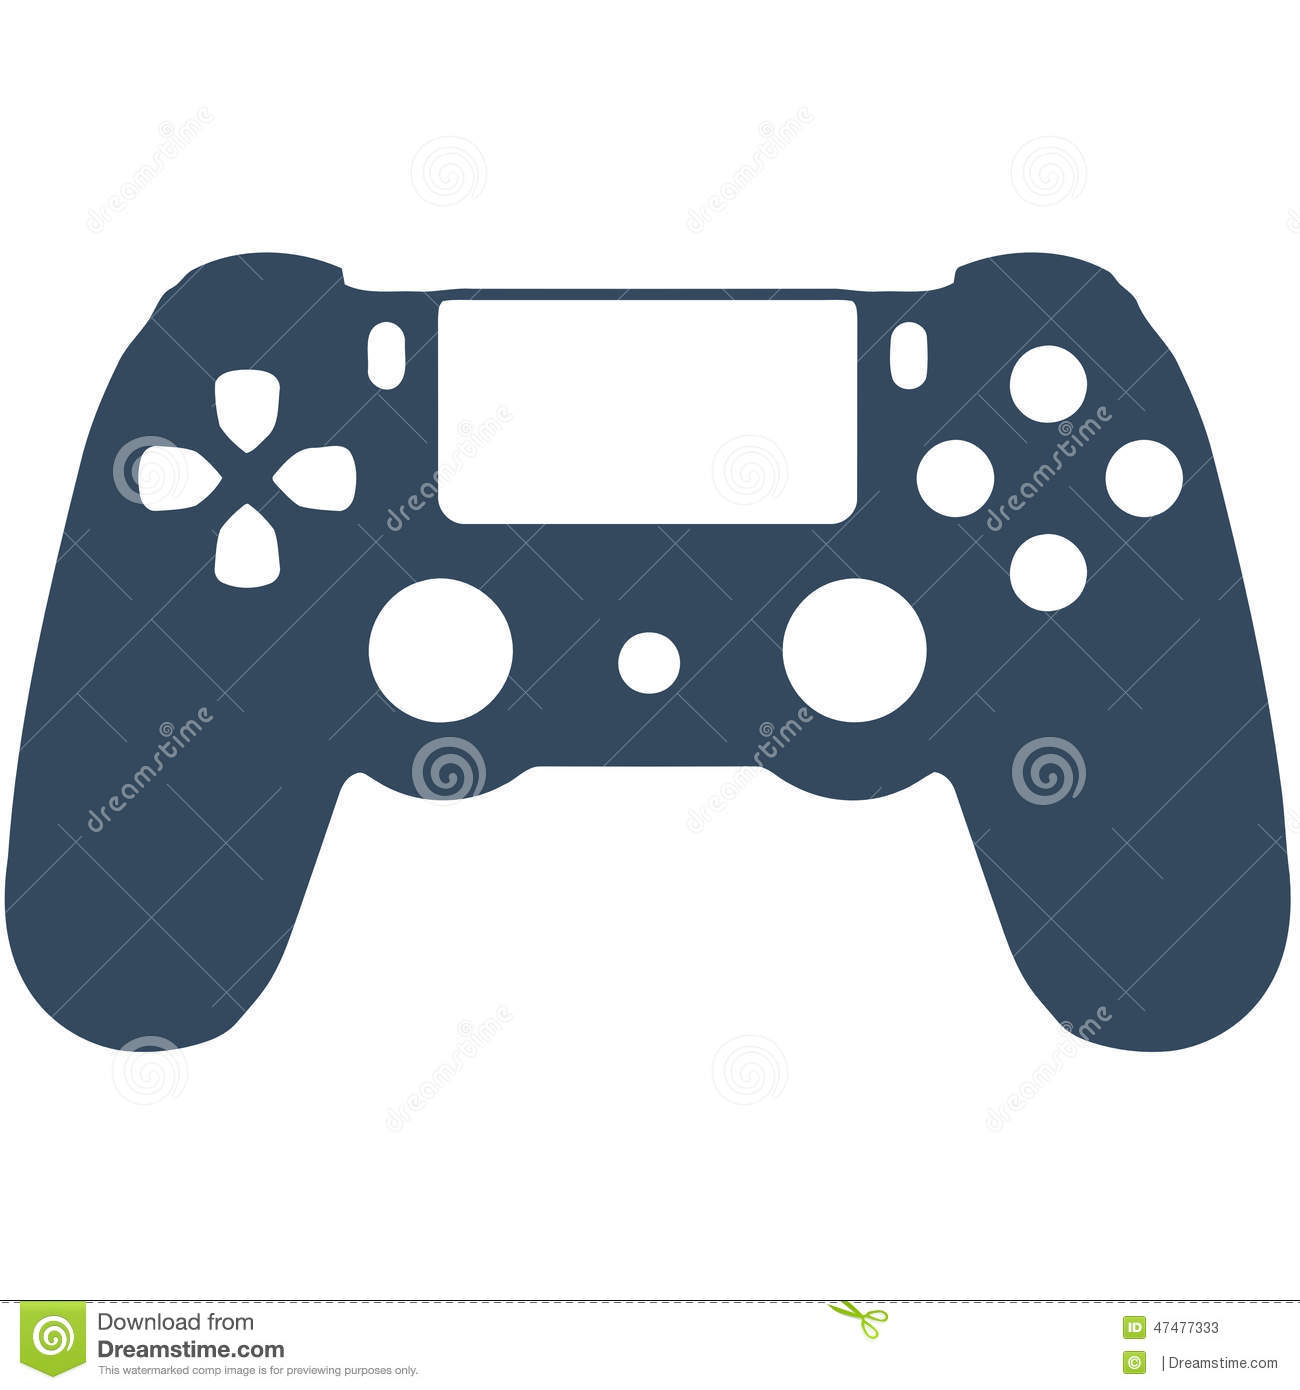 PS4 Game Controller Cartoon